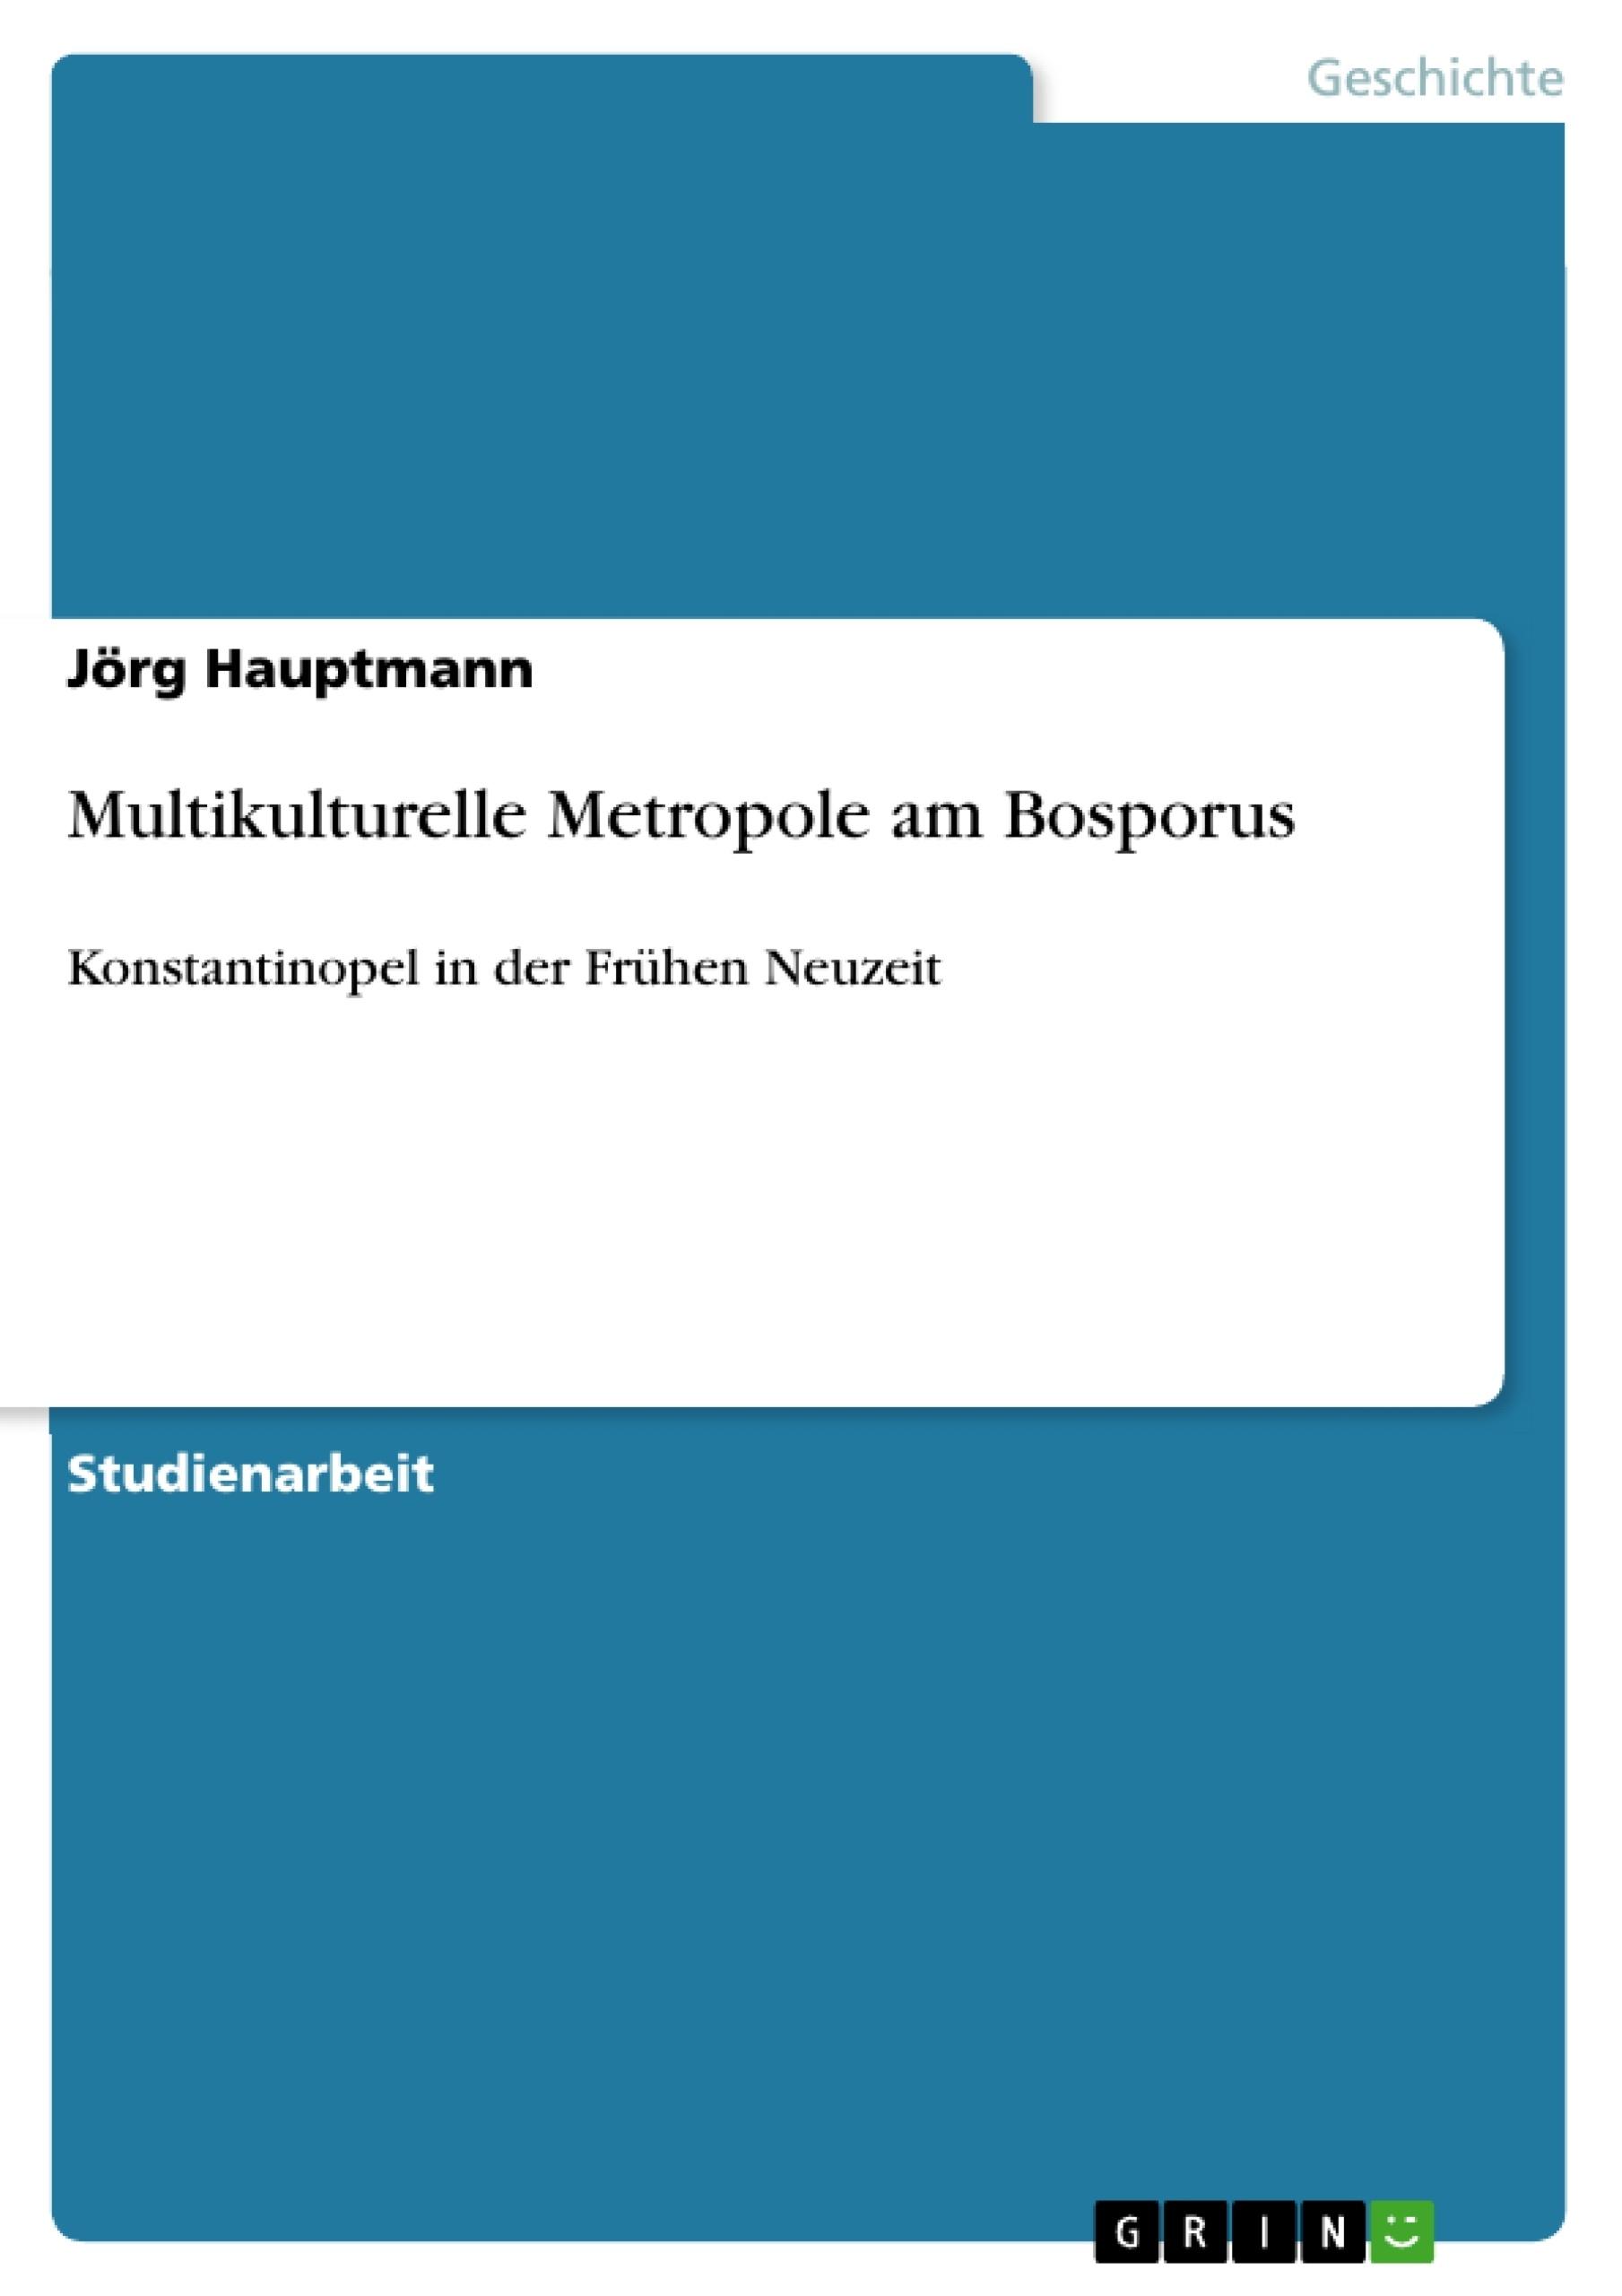 Titel: Multikulturelle Metropole am Bosporus